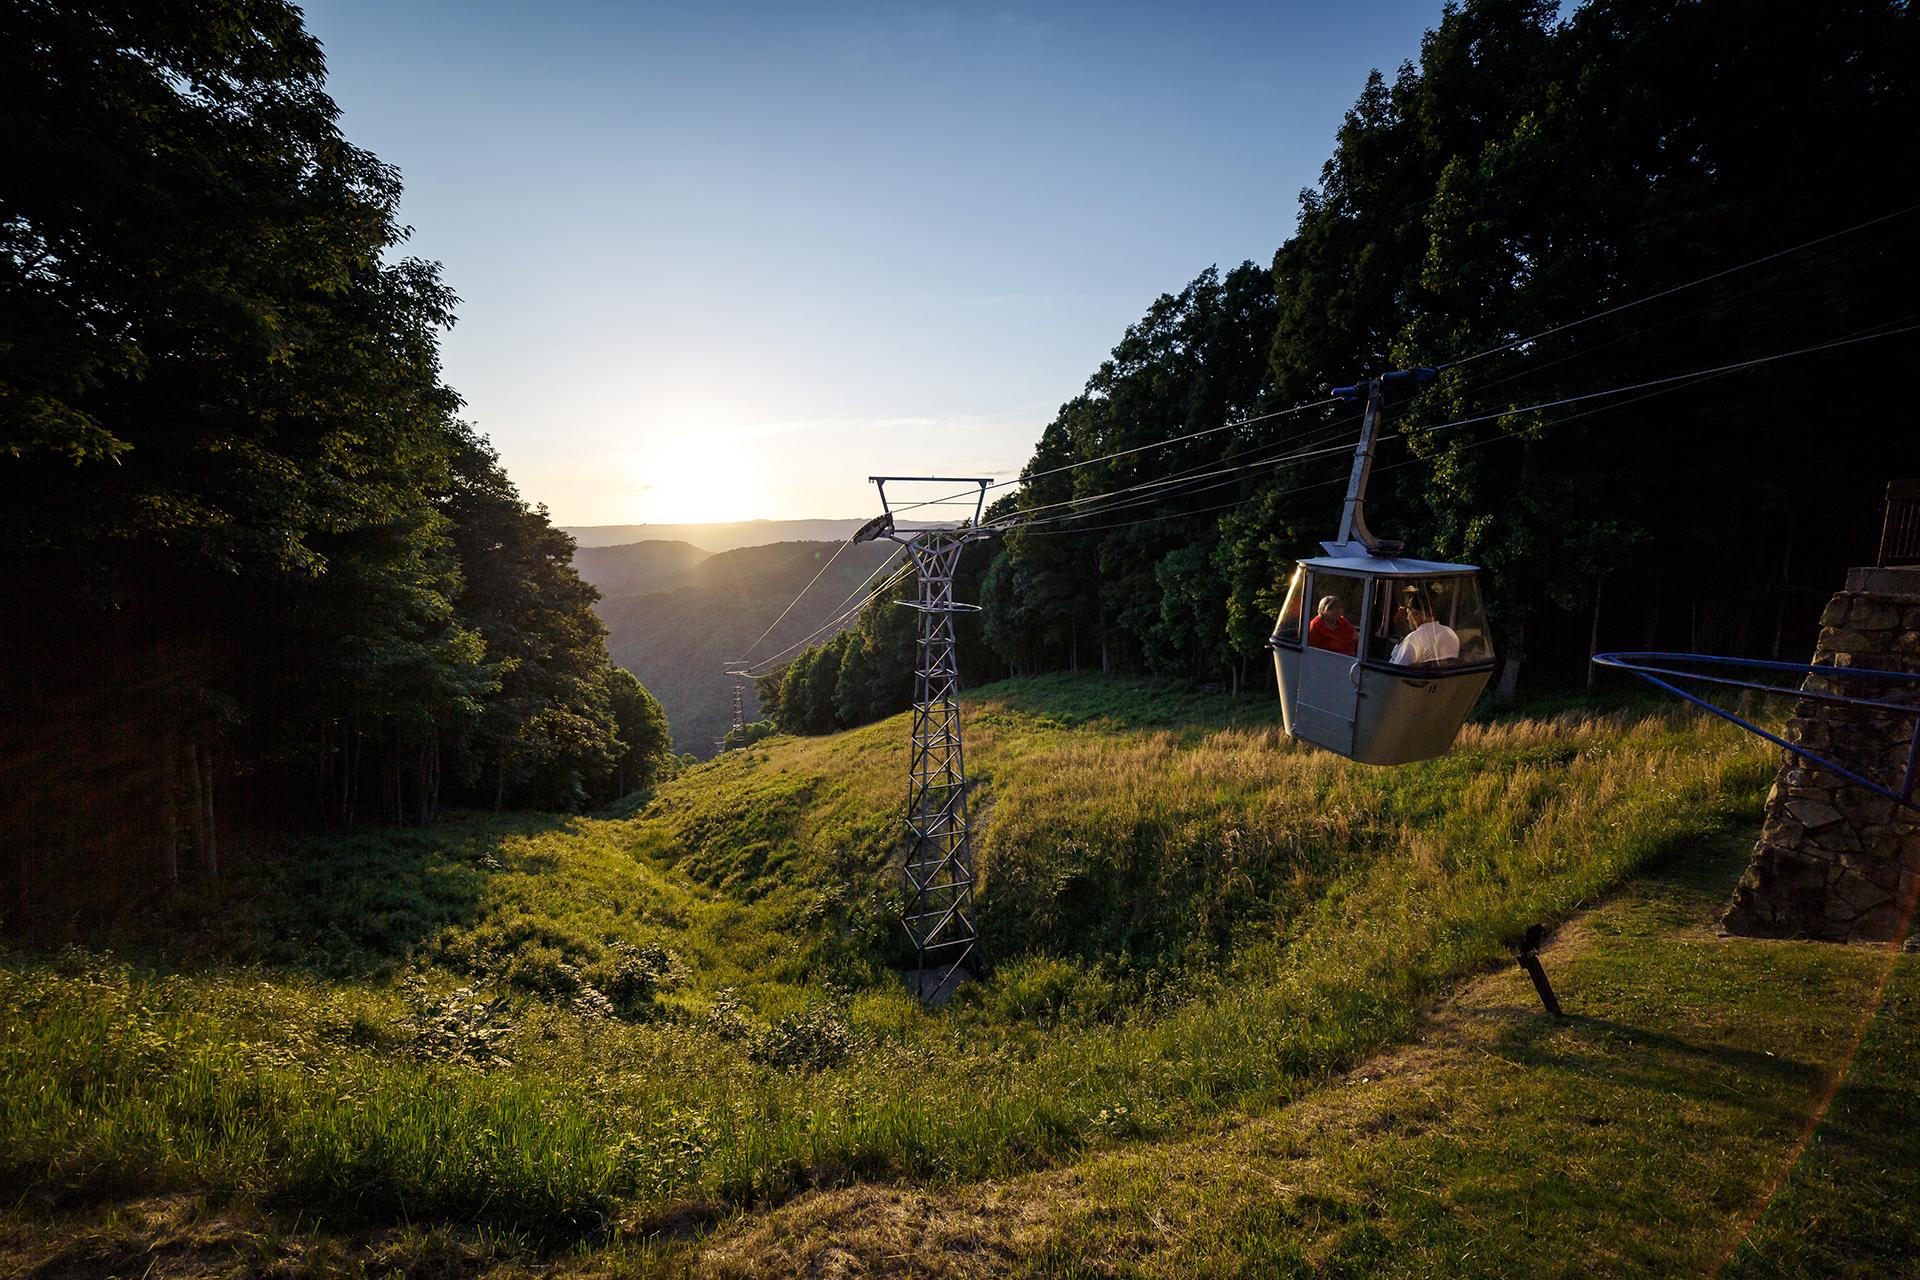 Pipestem-Aerial-Tram